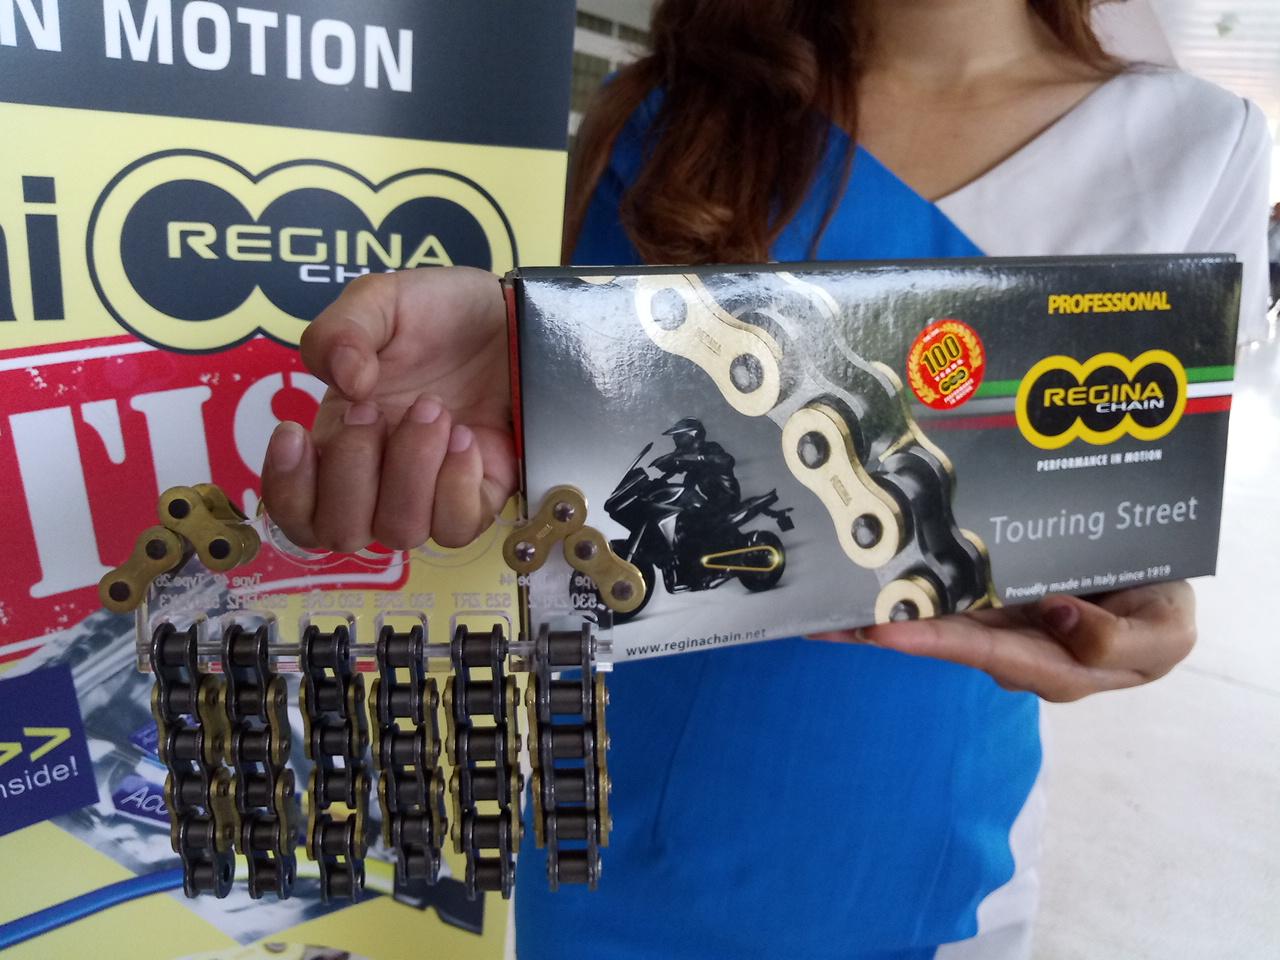 Regina Rantai Motor Italia